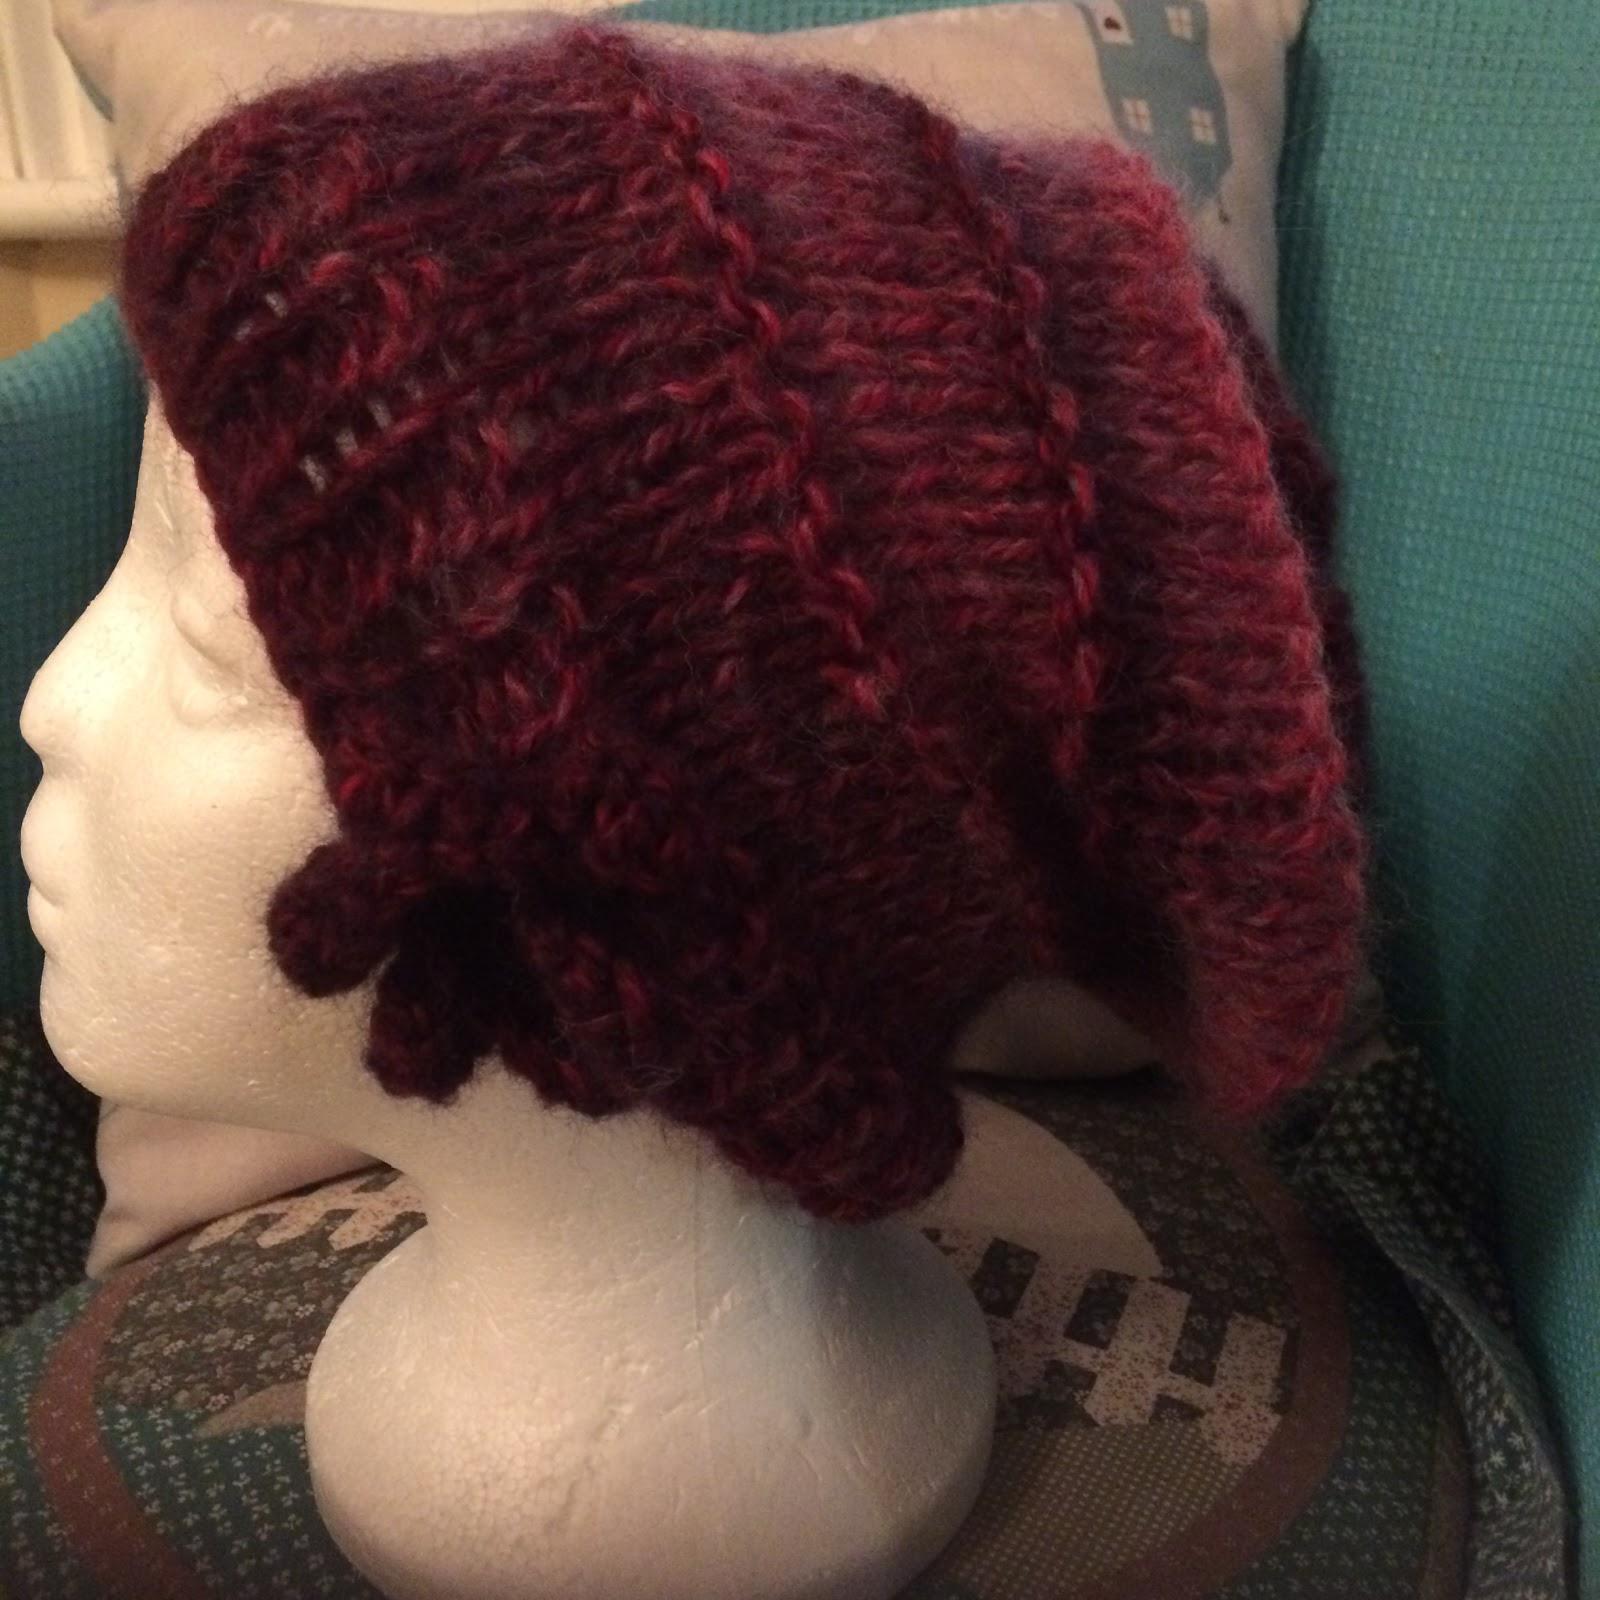 Get Knitting Grandma : Granny s world knitting projects